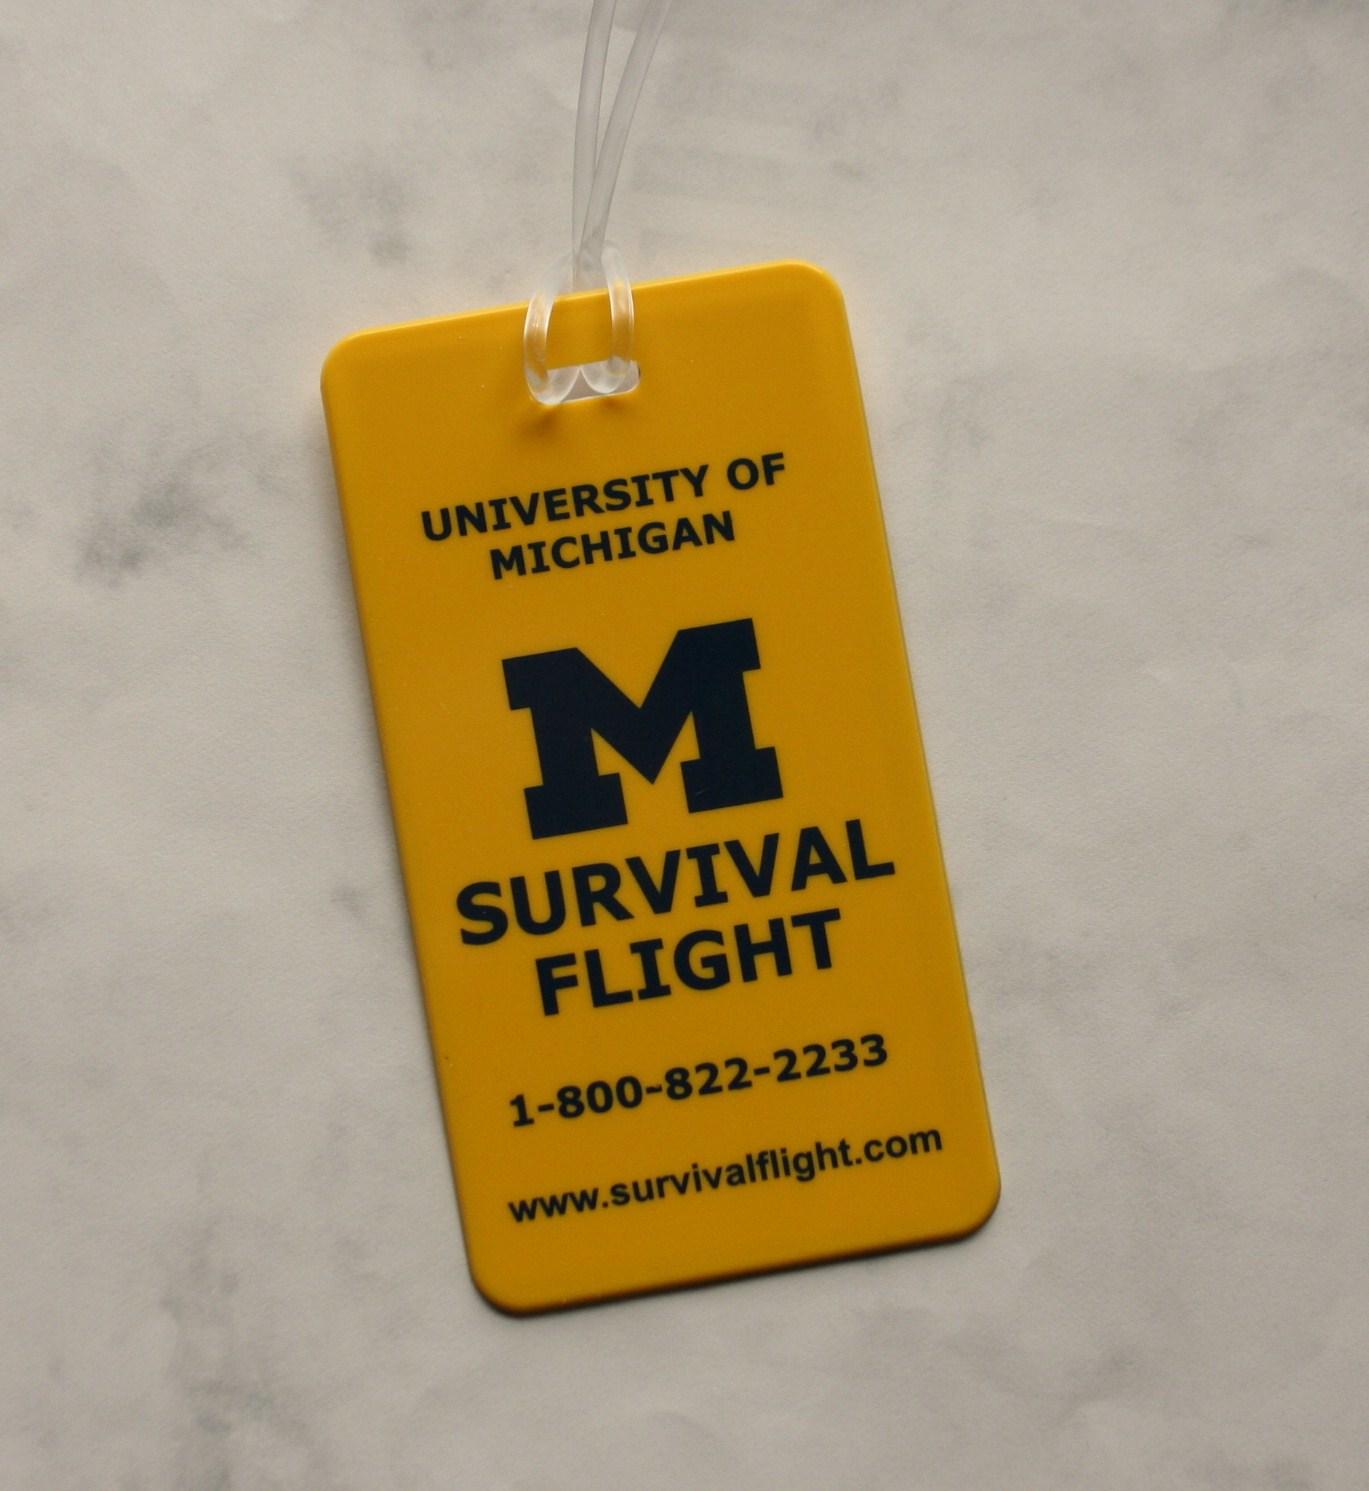 Survival Flight Luggage tag